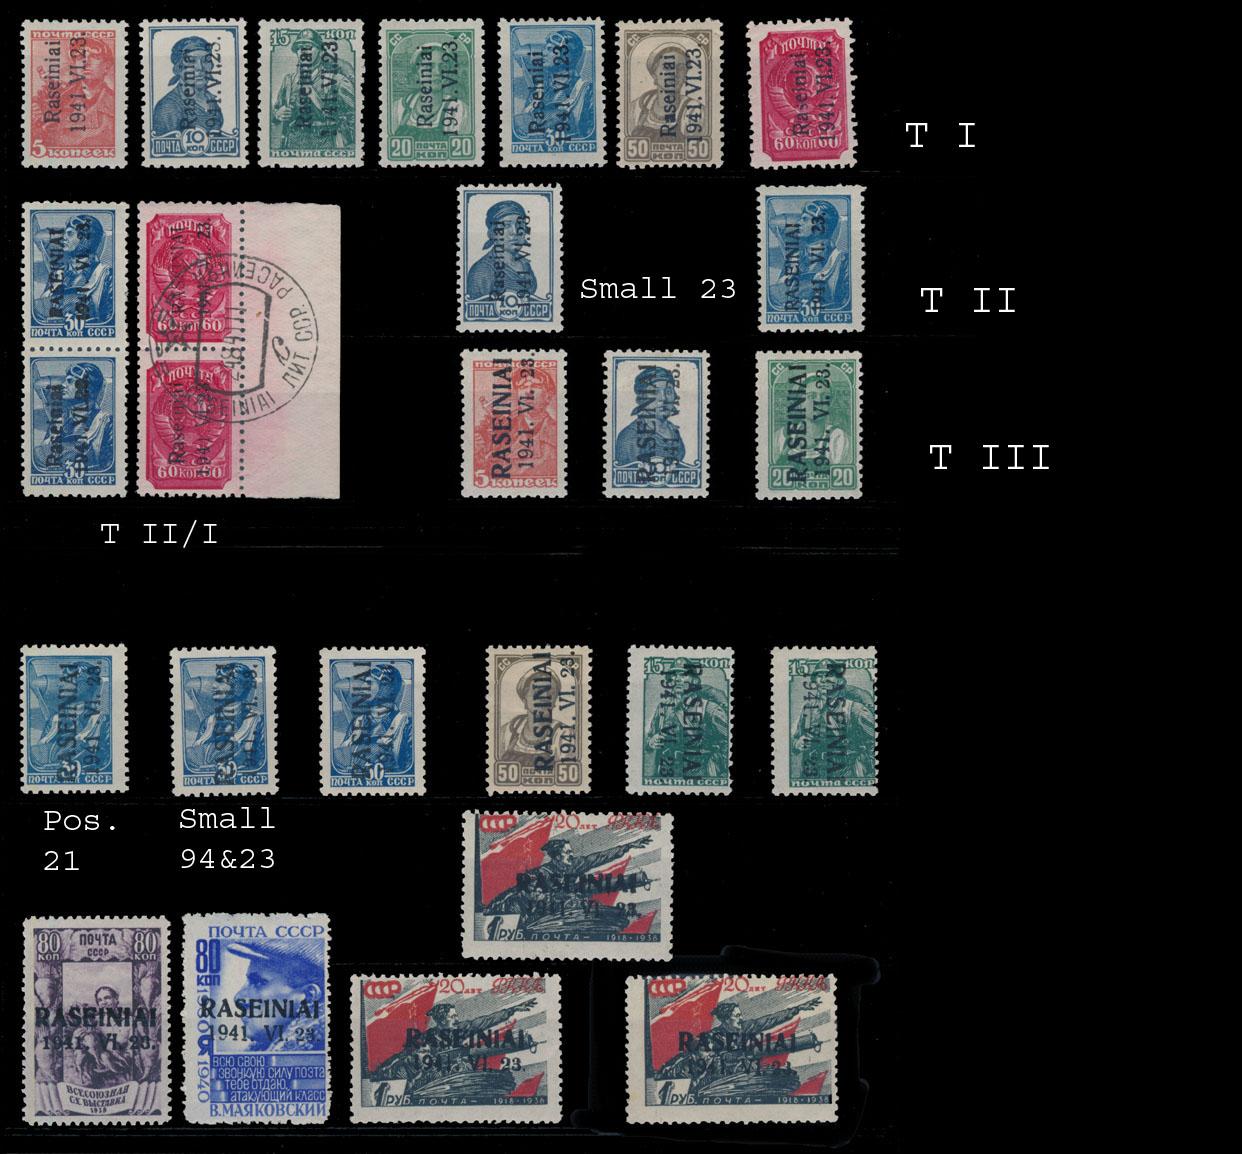 Lot 428 - germany. occupation issues of the world war ii Lithuania (Litauen) - Raseiniai (Rosingen) -  Raritan Stamps Inc. Live Bidding Auction #80